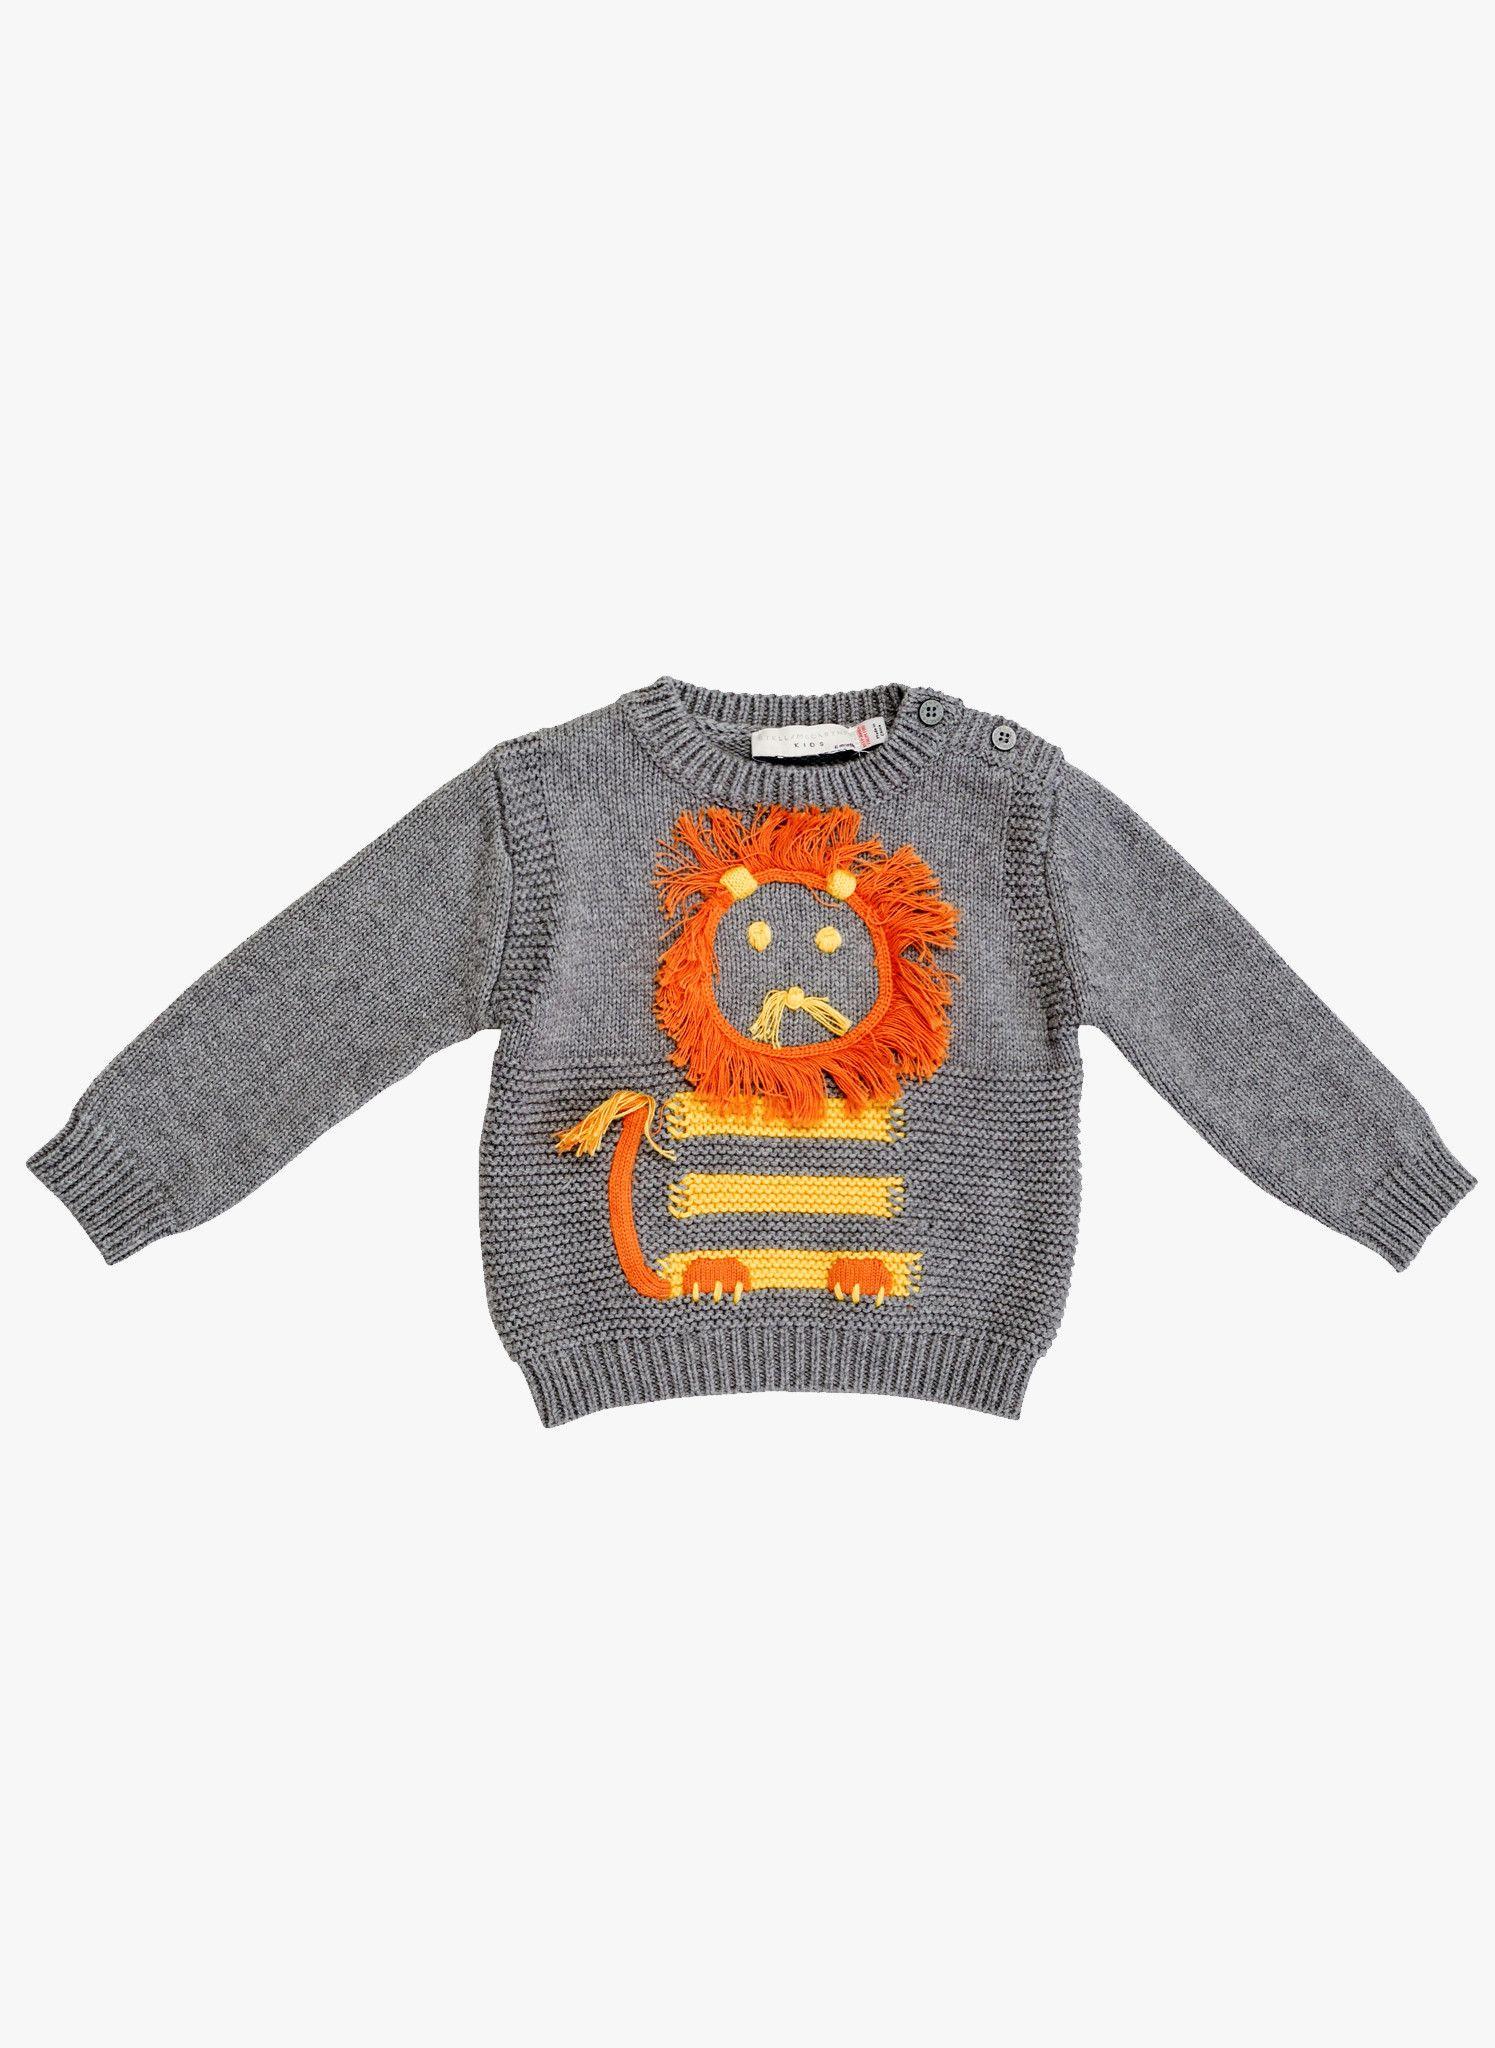 Stella McCartney Kids Ira Lion Baby Knit Sweater in Grey - PRE-ORDER ...